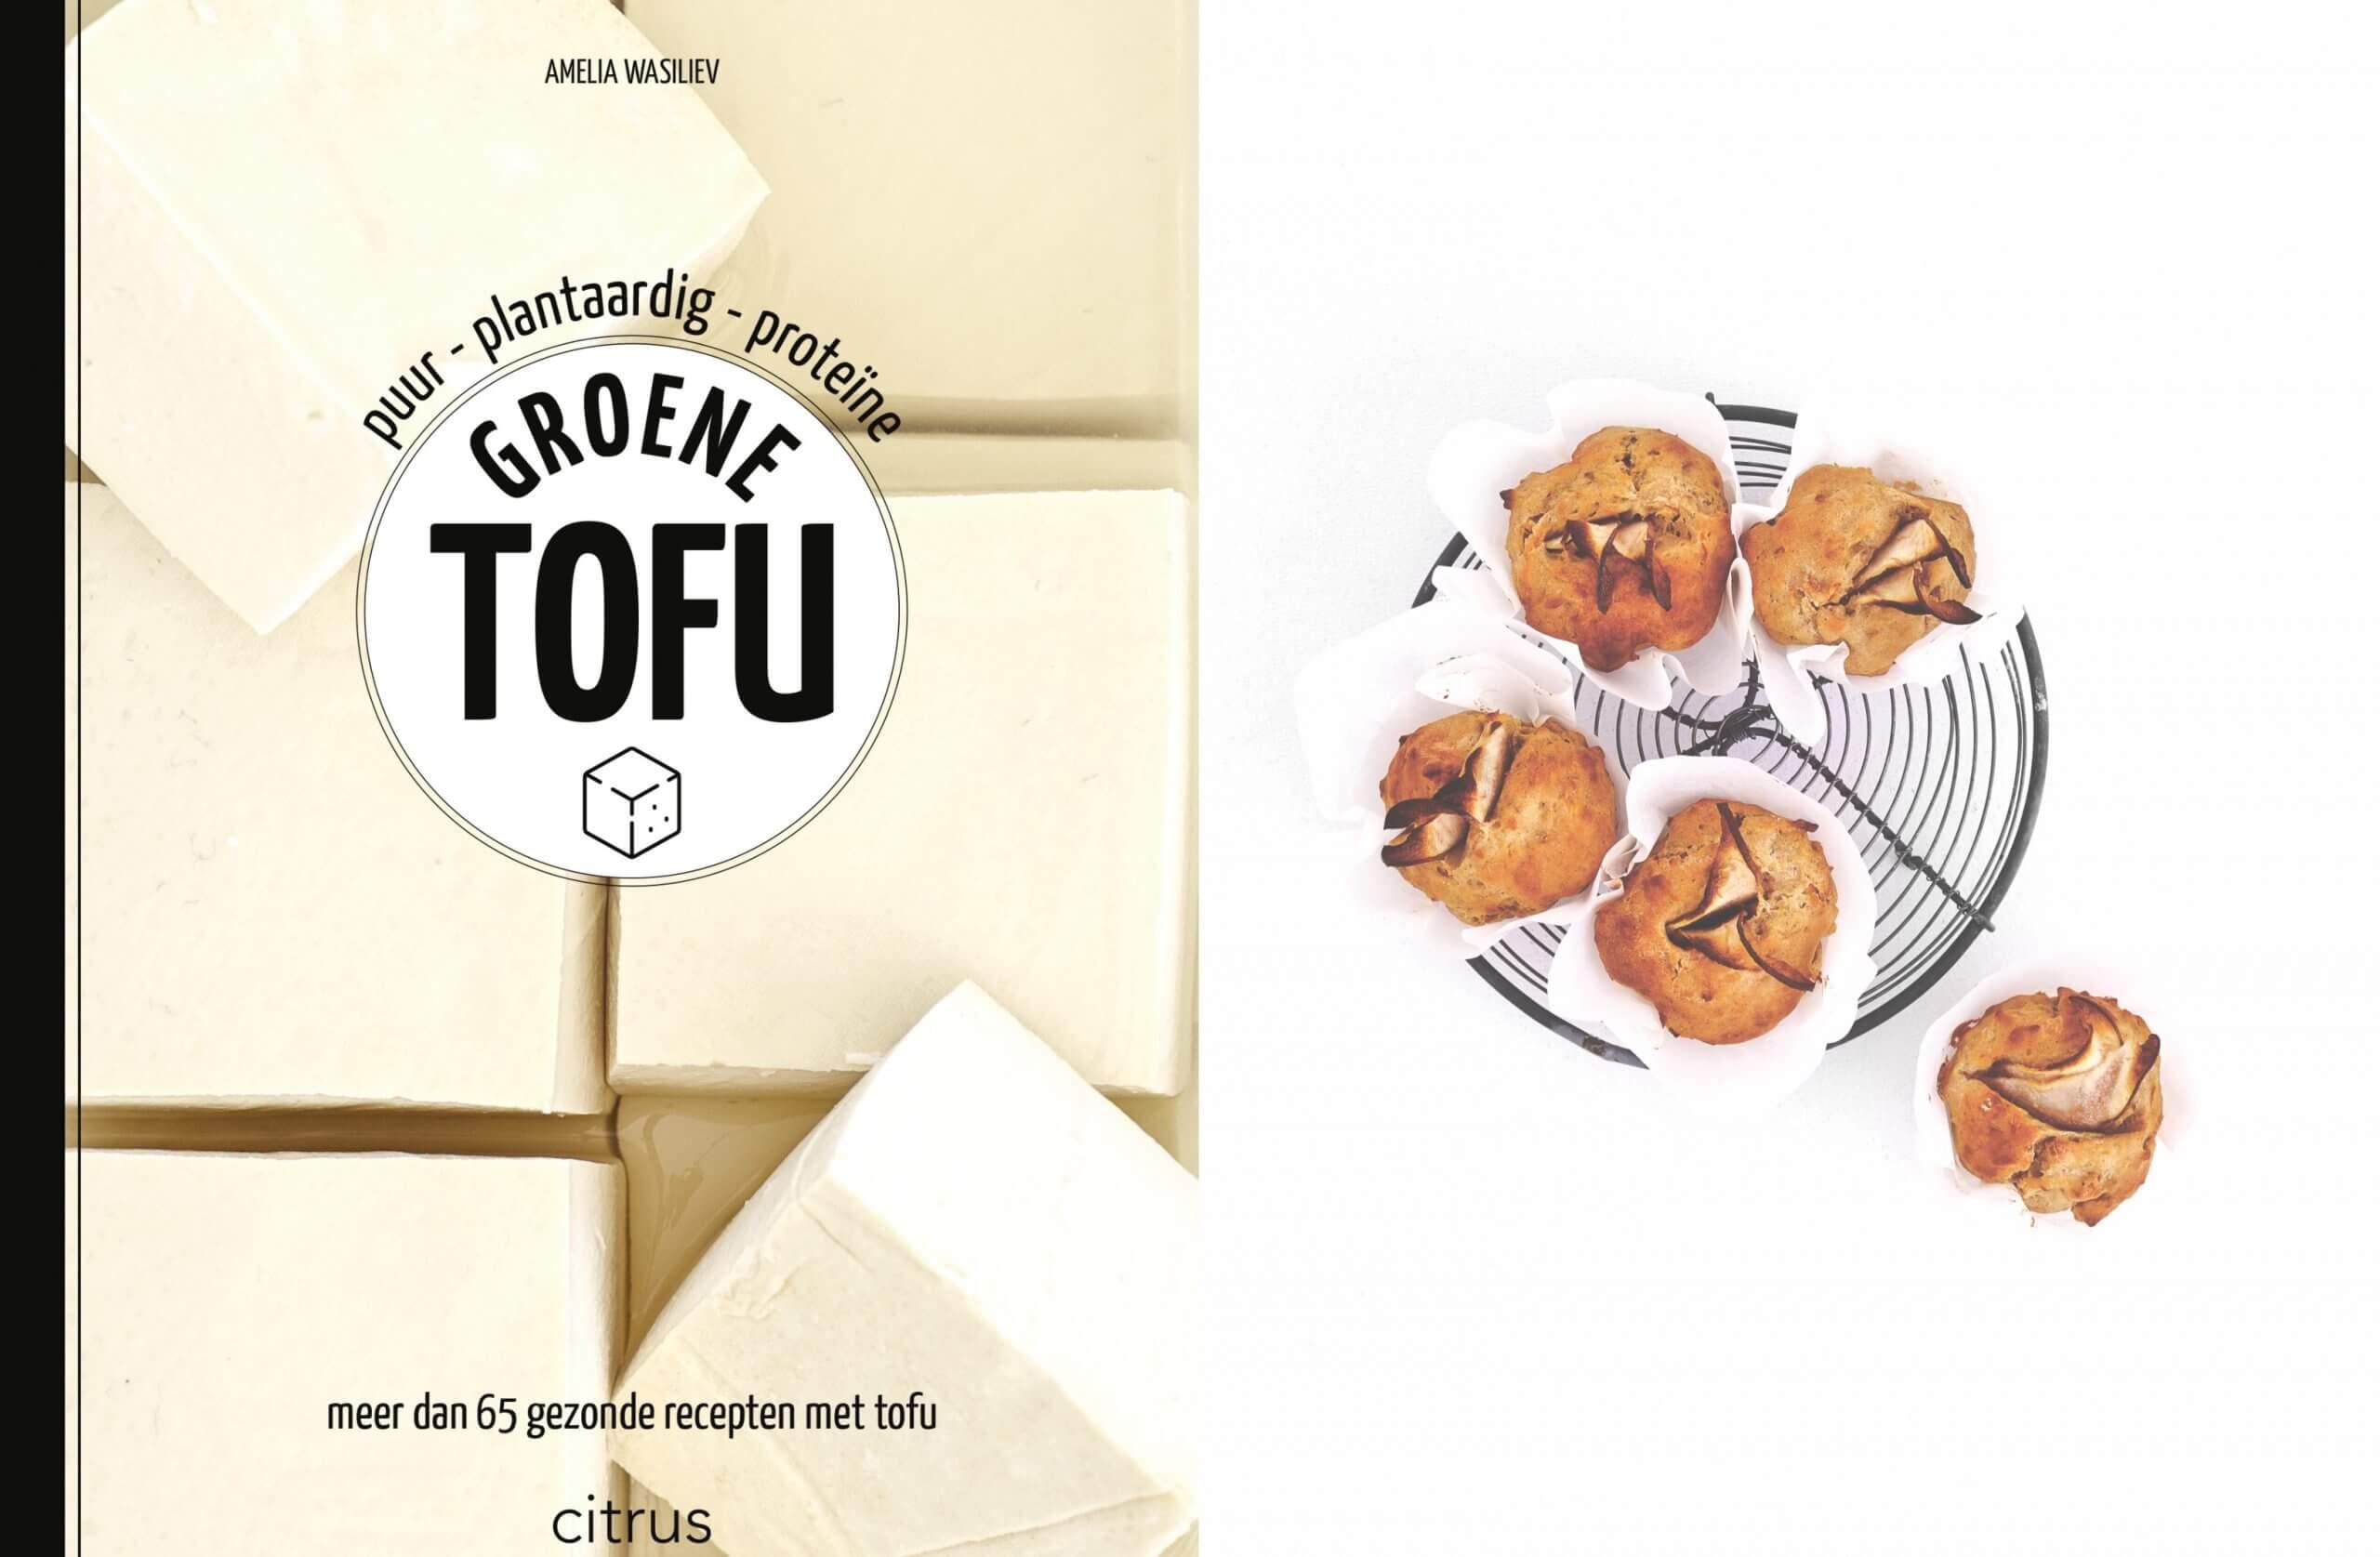 Kookboek review: Groene tofu